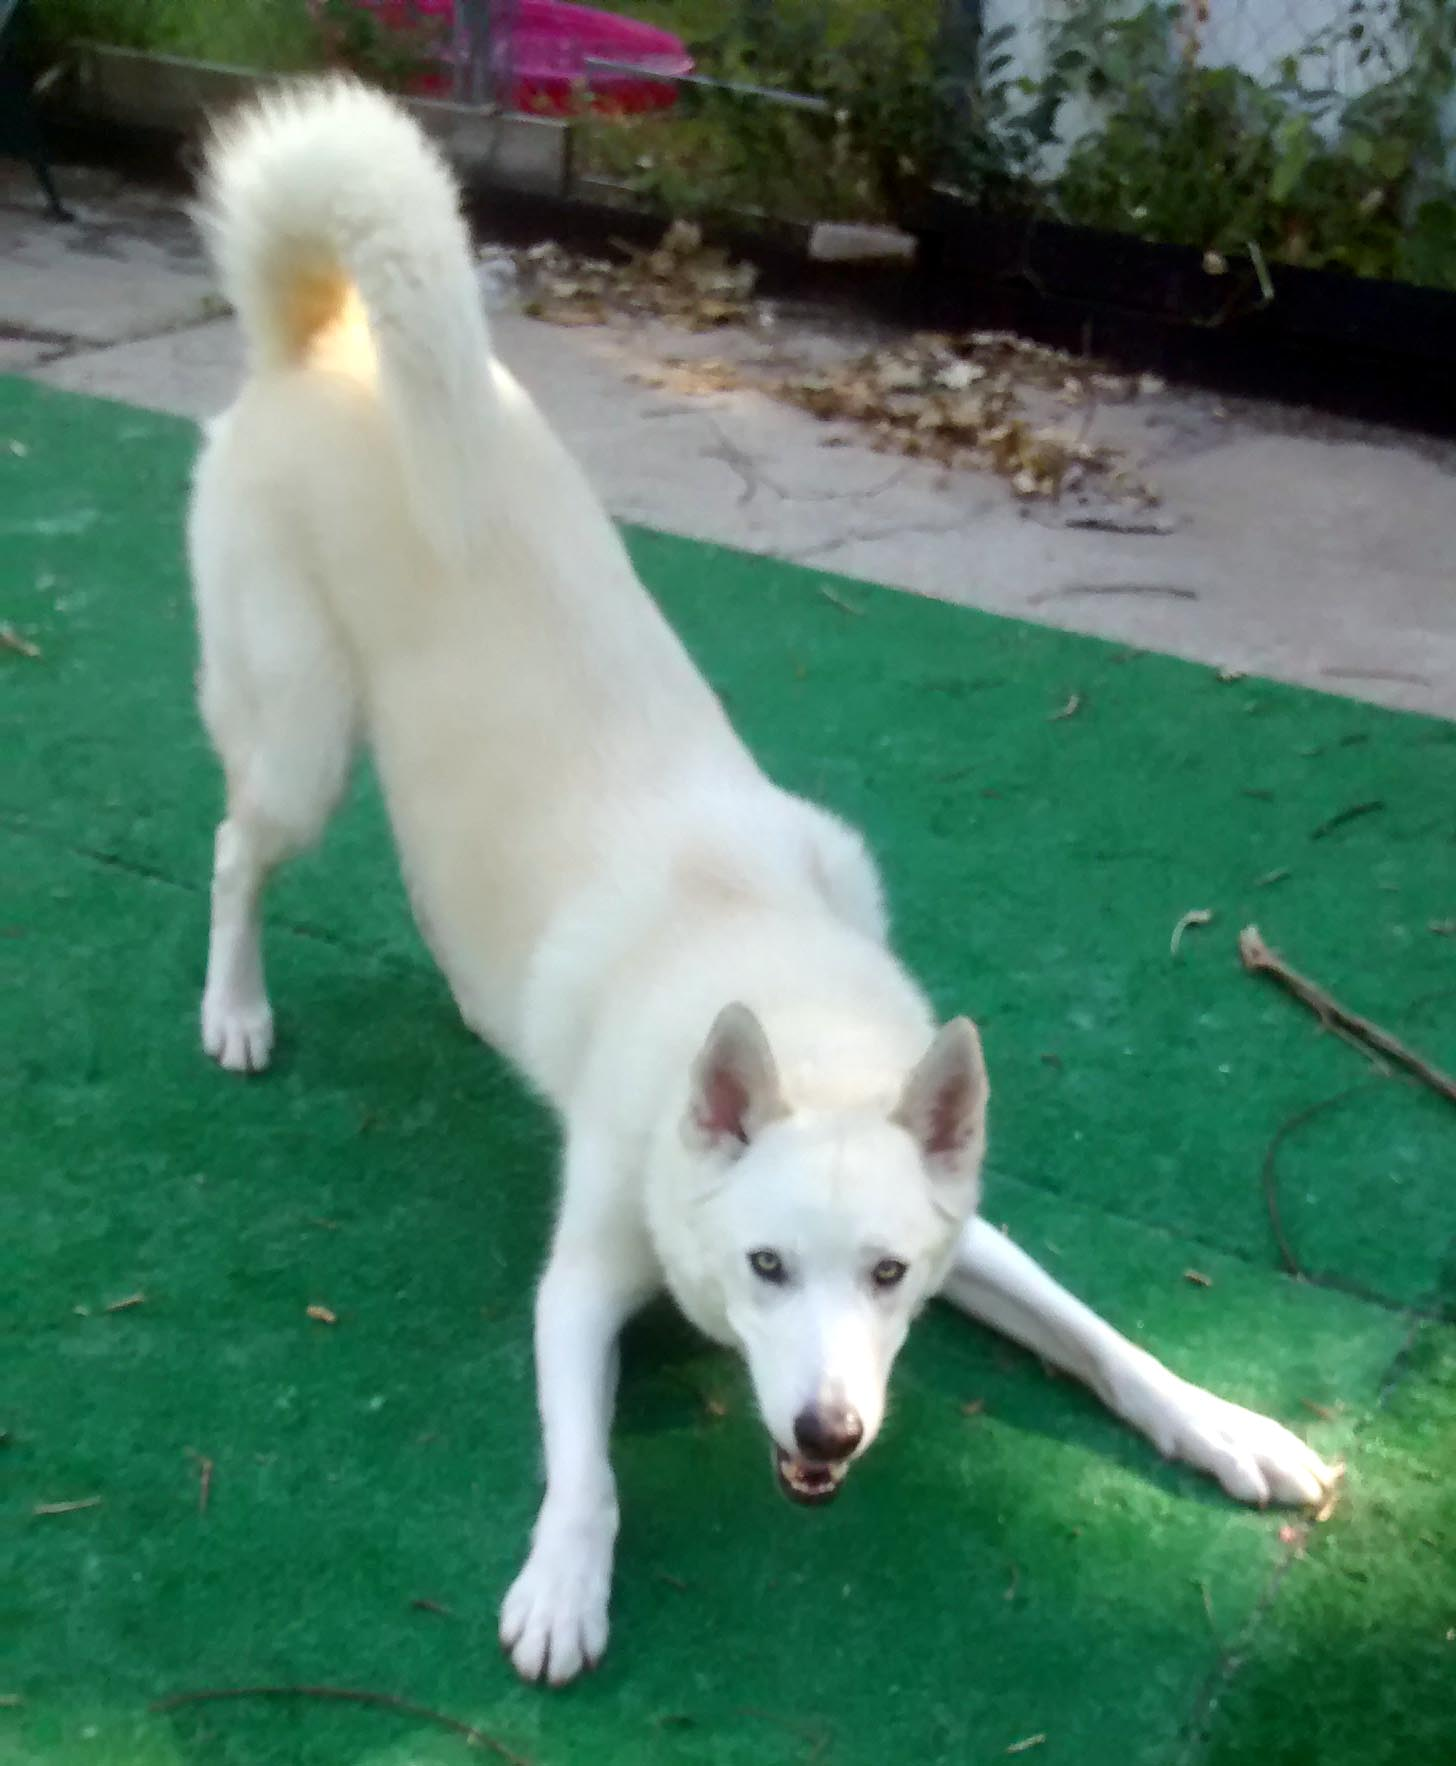 Dark Loki A Play Bow Loki A Play Bow Puppy Tutor Play Bow Dog Daycare Makati Dog Play Bow To Cat bark post Dog Play Bow